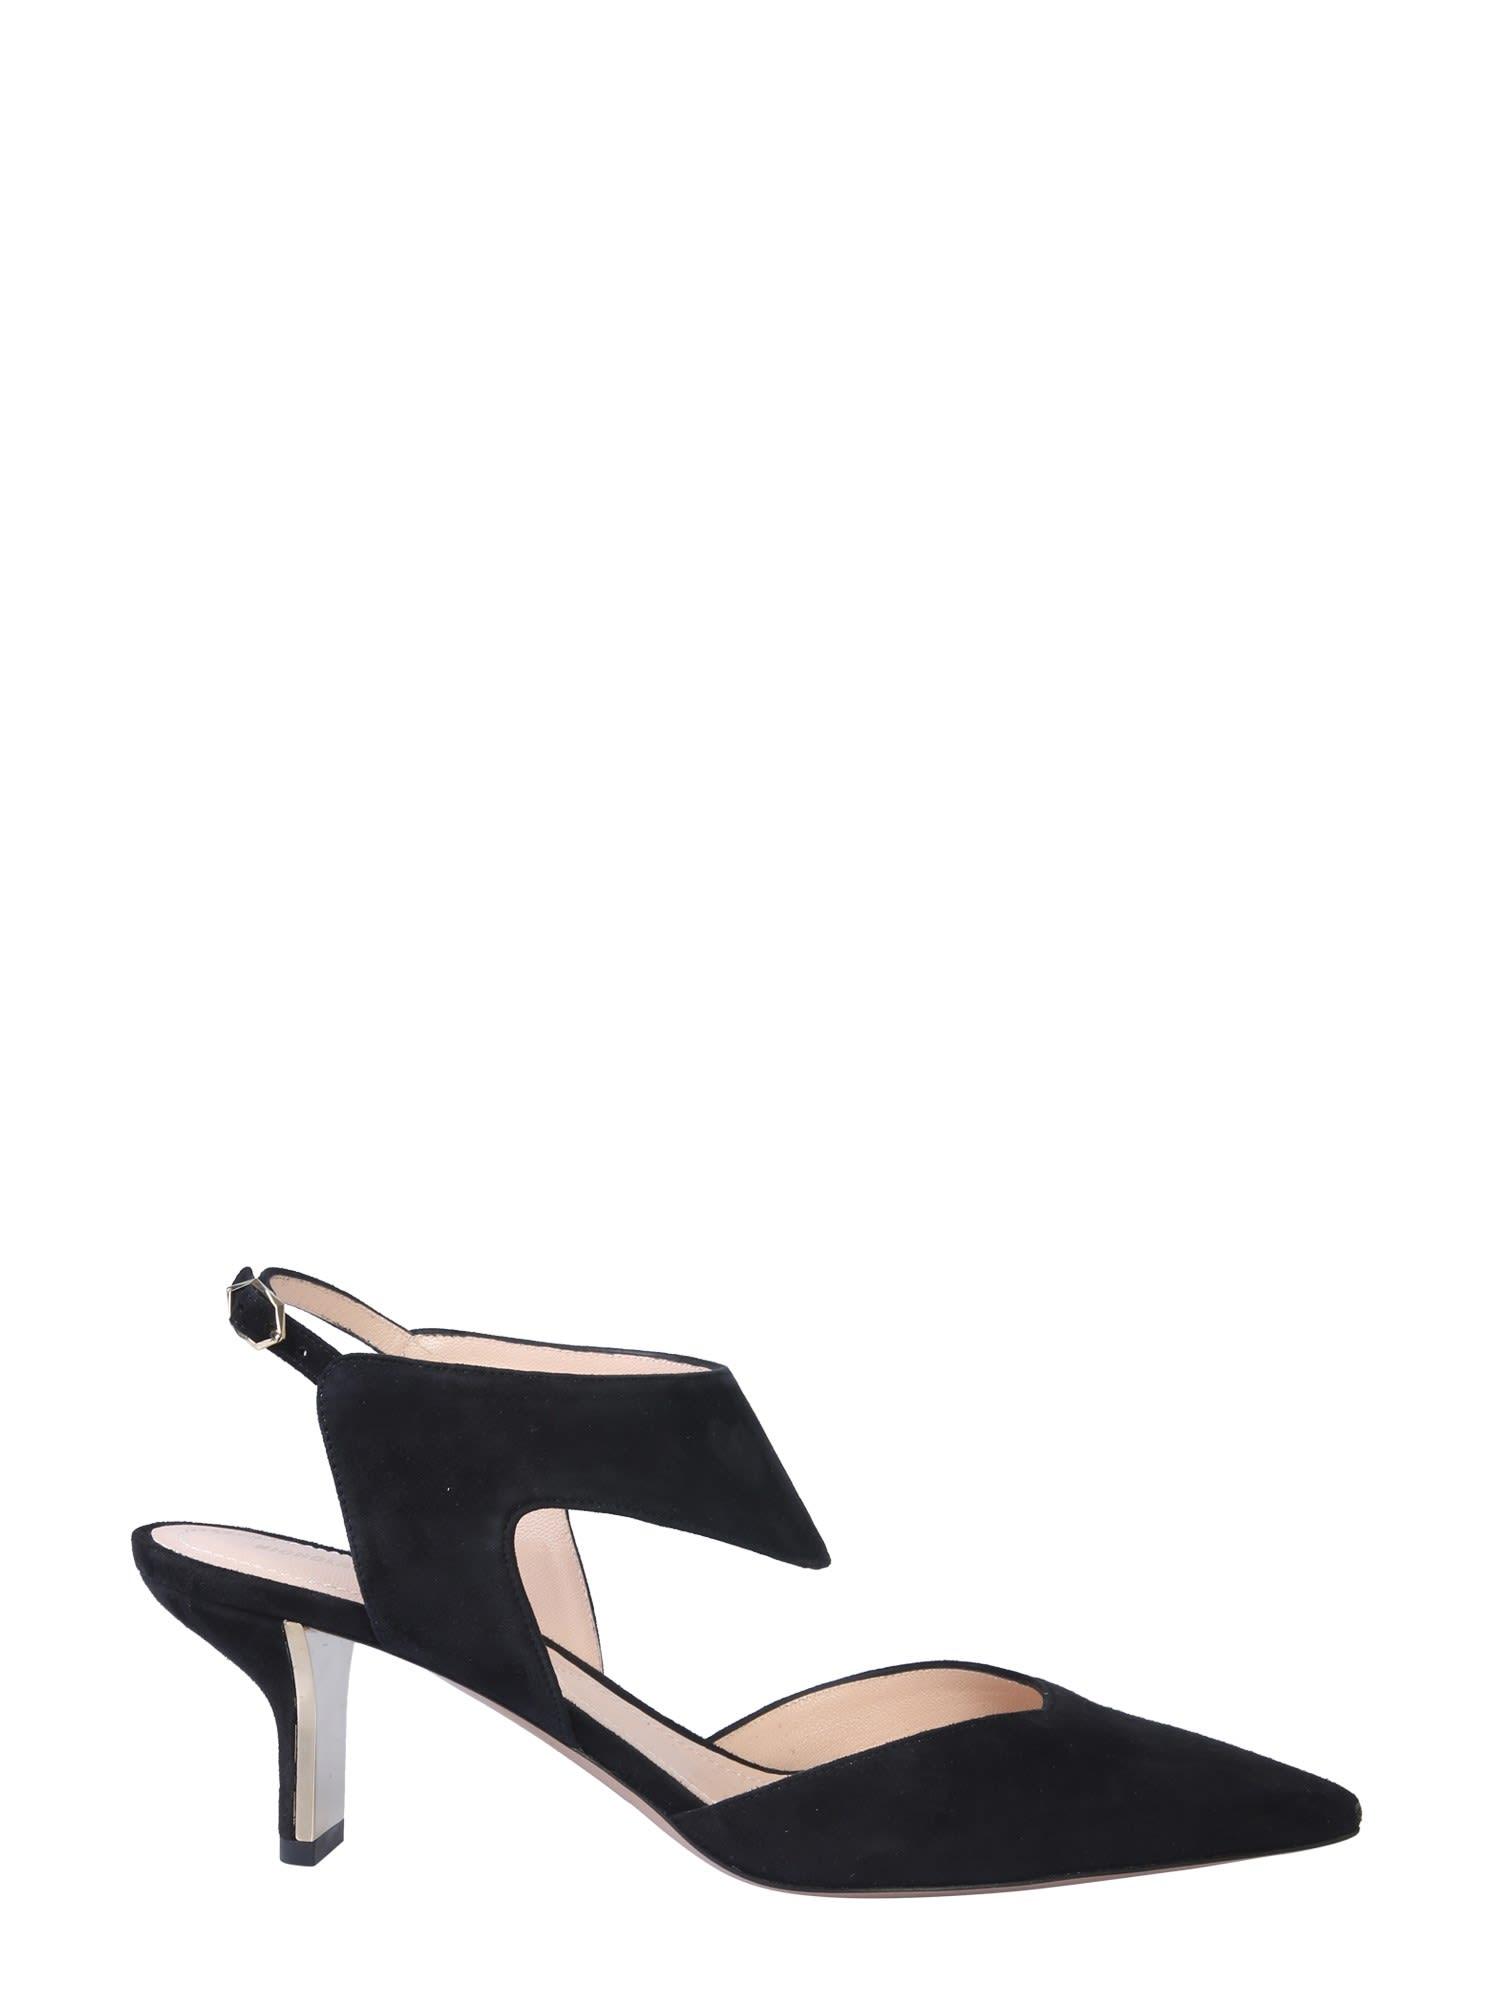 Buy Nicholas Kirkwood Leelo Sling Pump Sandal online, shop Nicholas Kirkwood shoes with free shipping